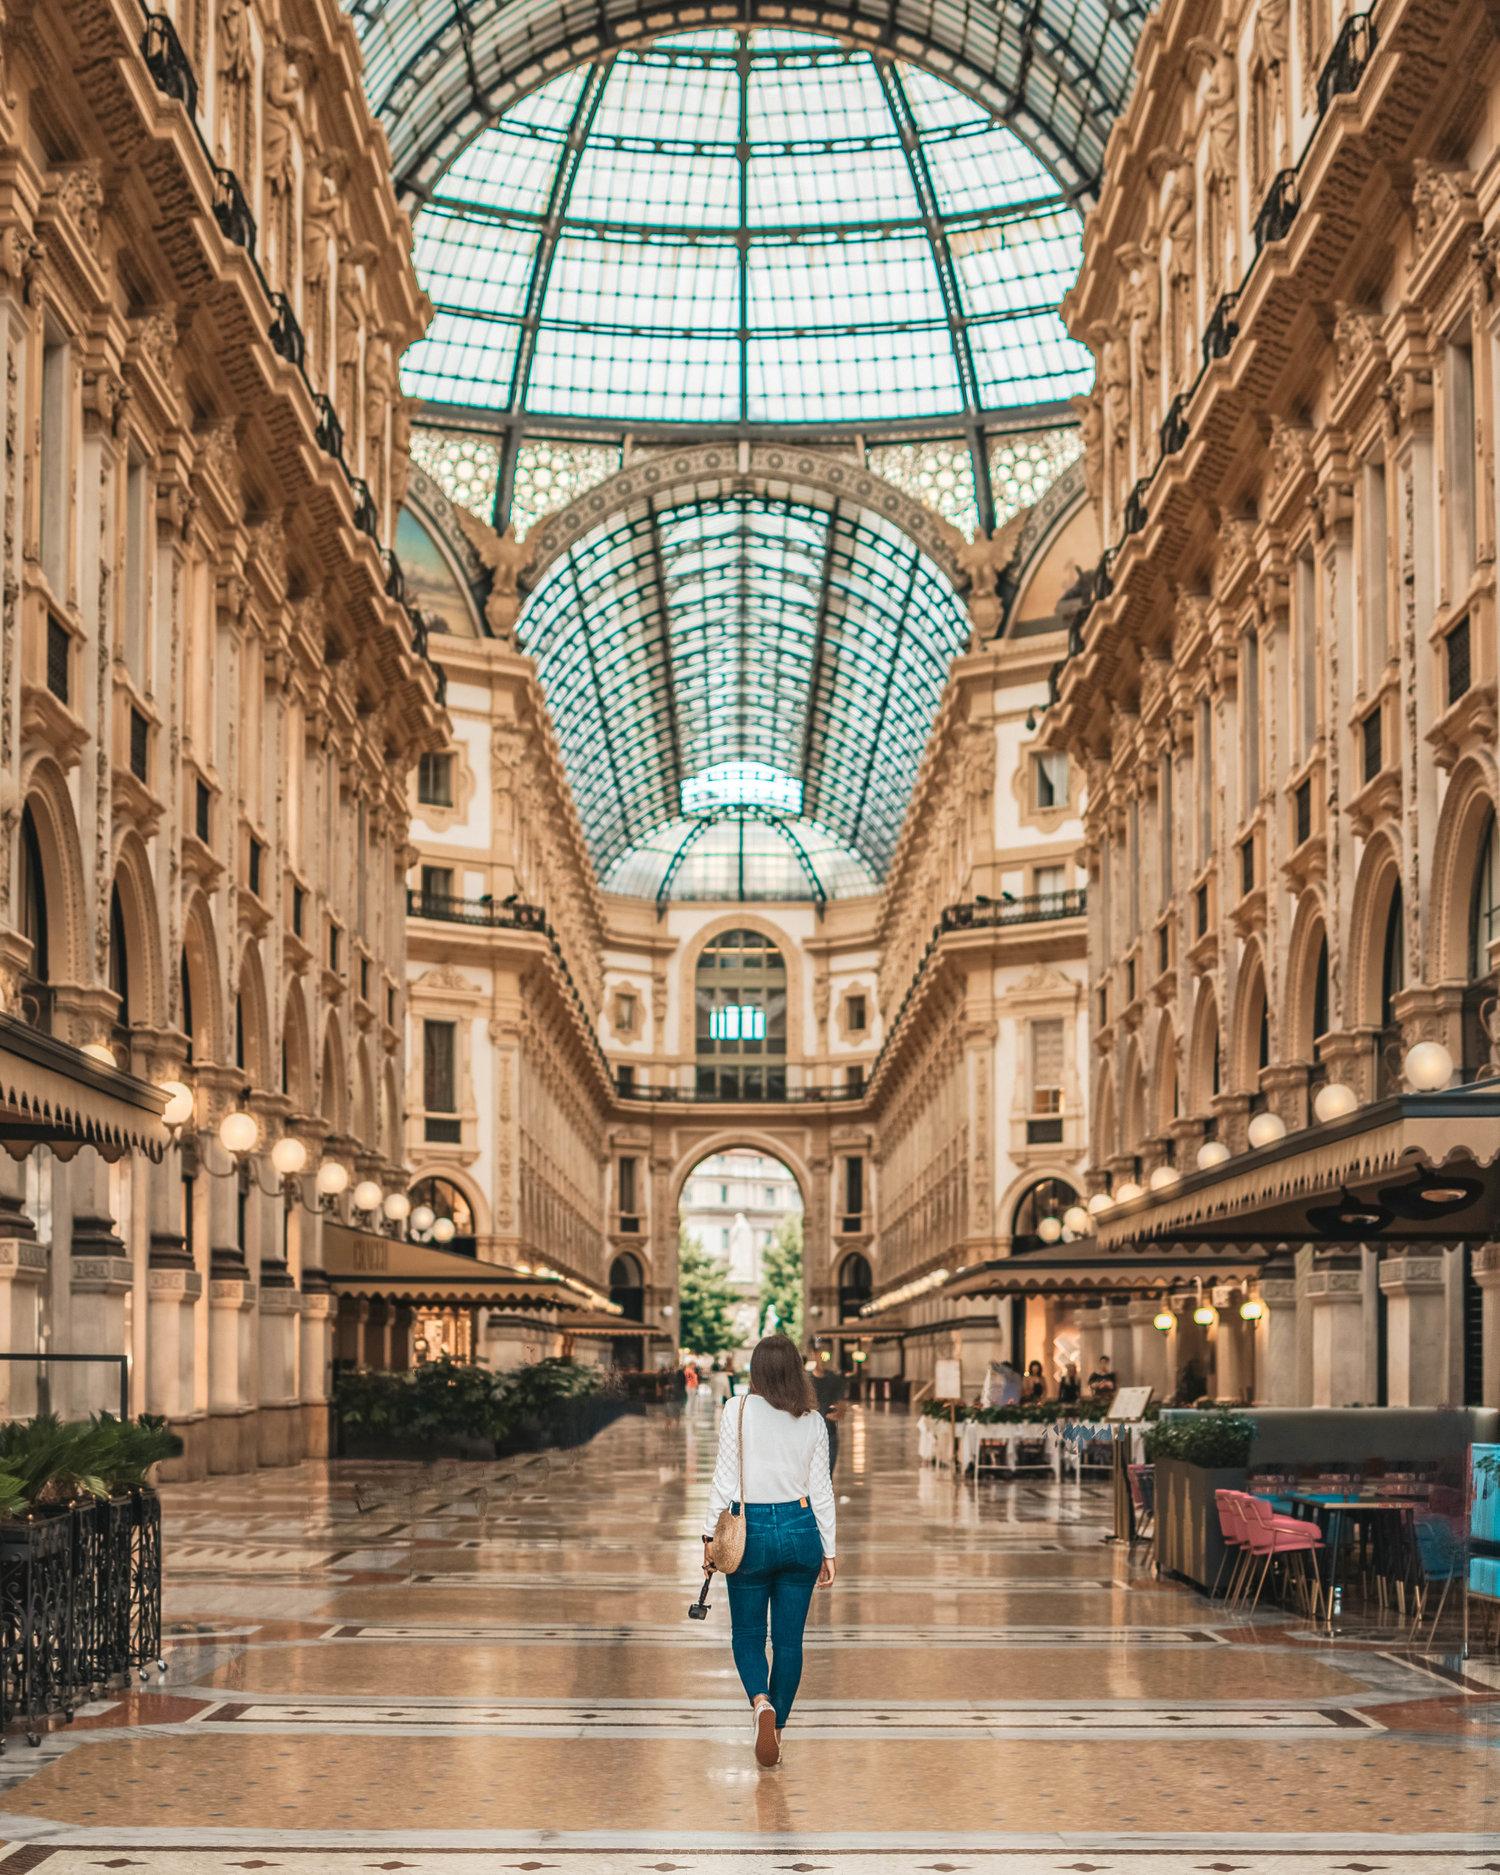 Milan S Duomo And Surroundings Genuinescape